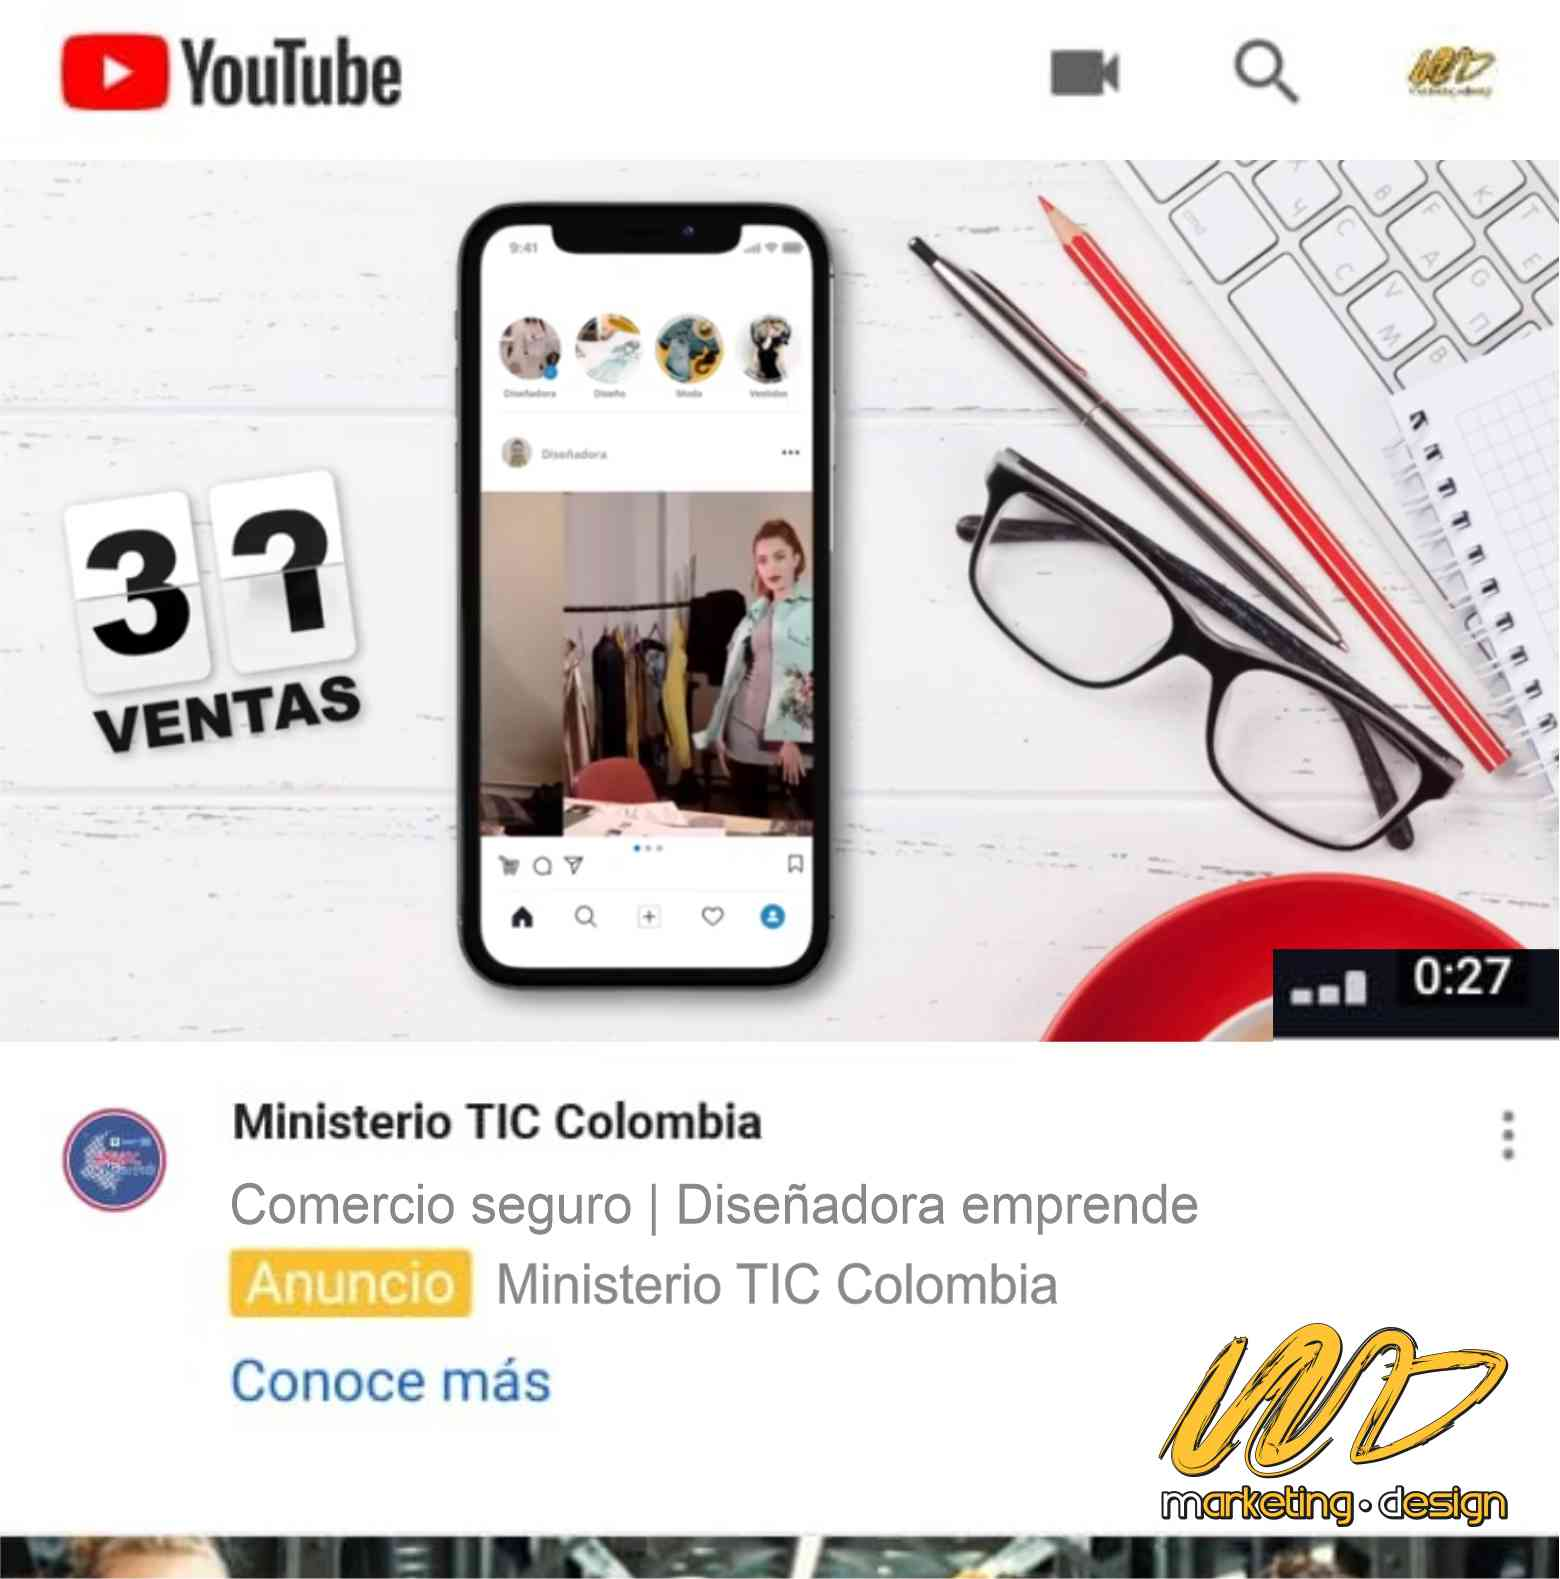 Clientes Pauta YouTube Marketing Design 1903